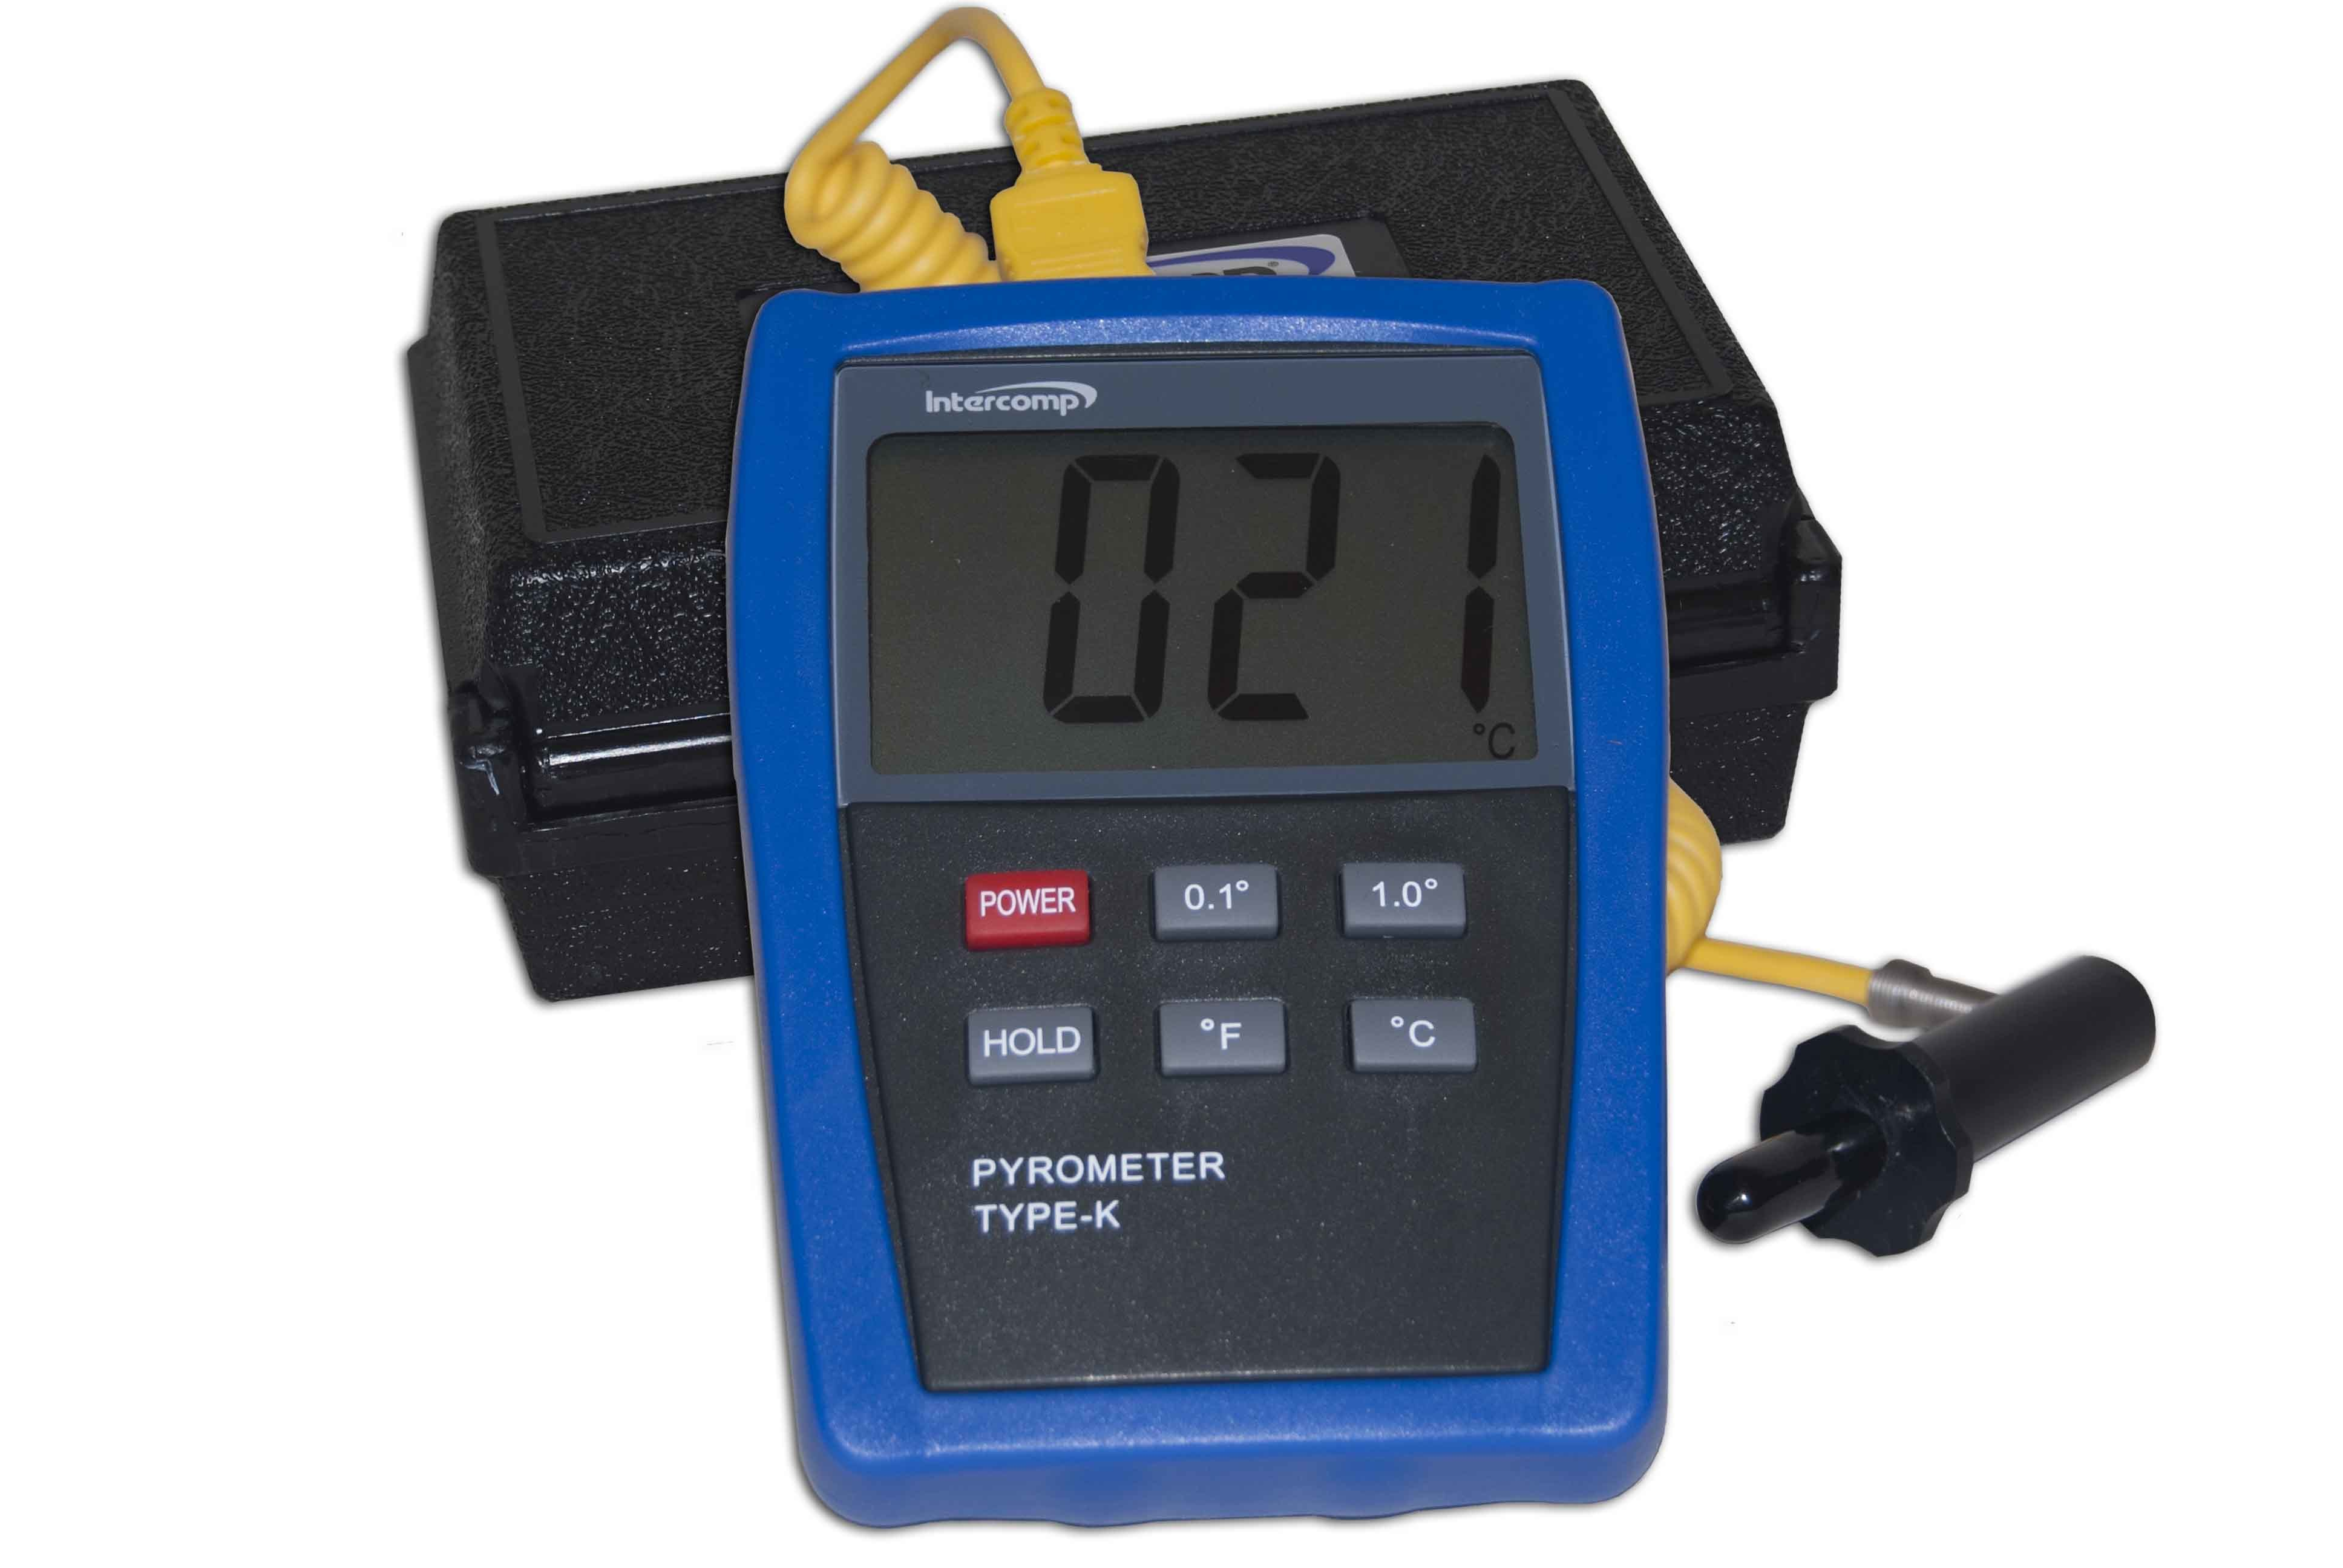 Intercomp Digitial Pyrometer w/Probe and Case